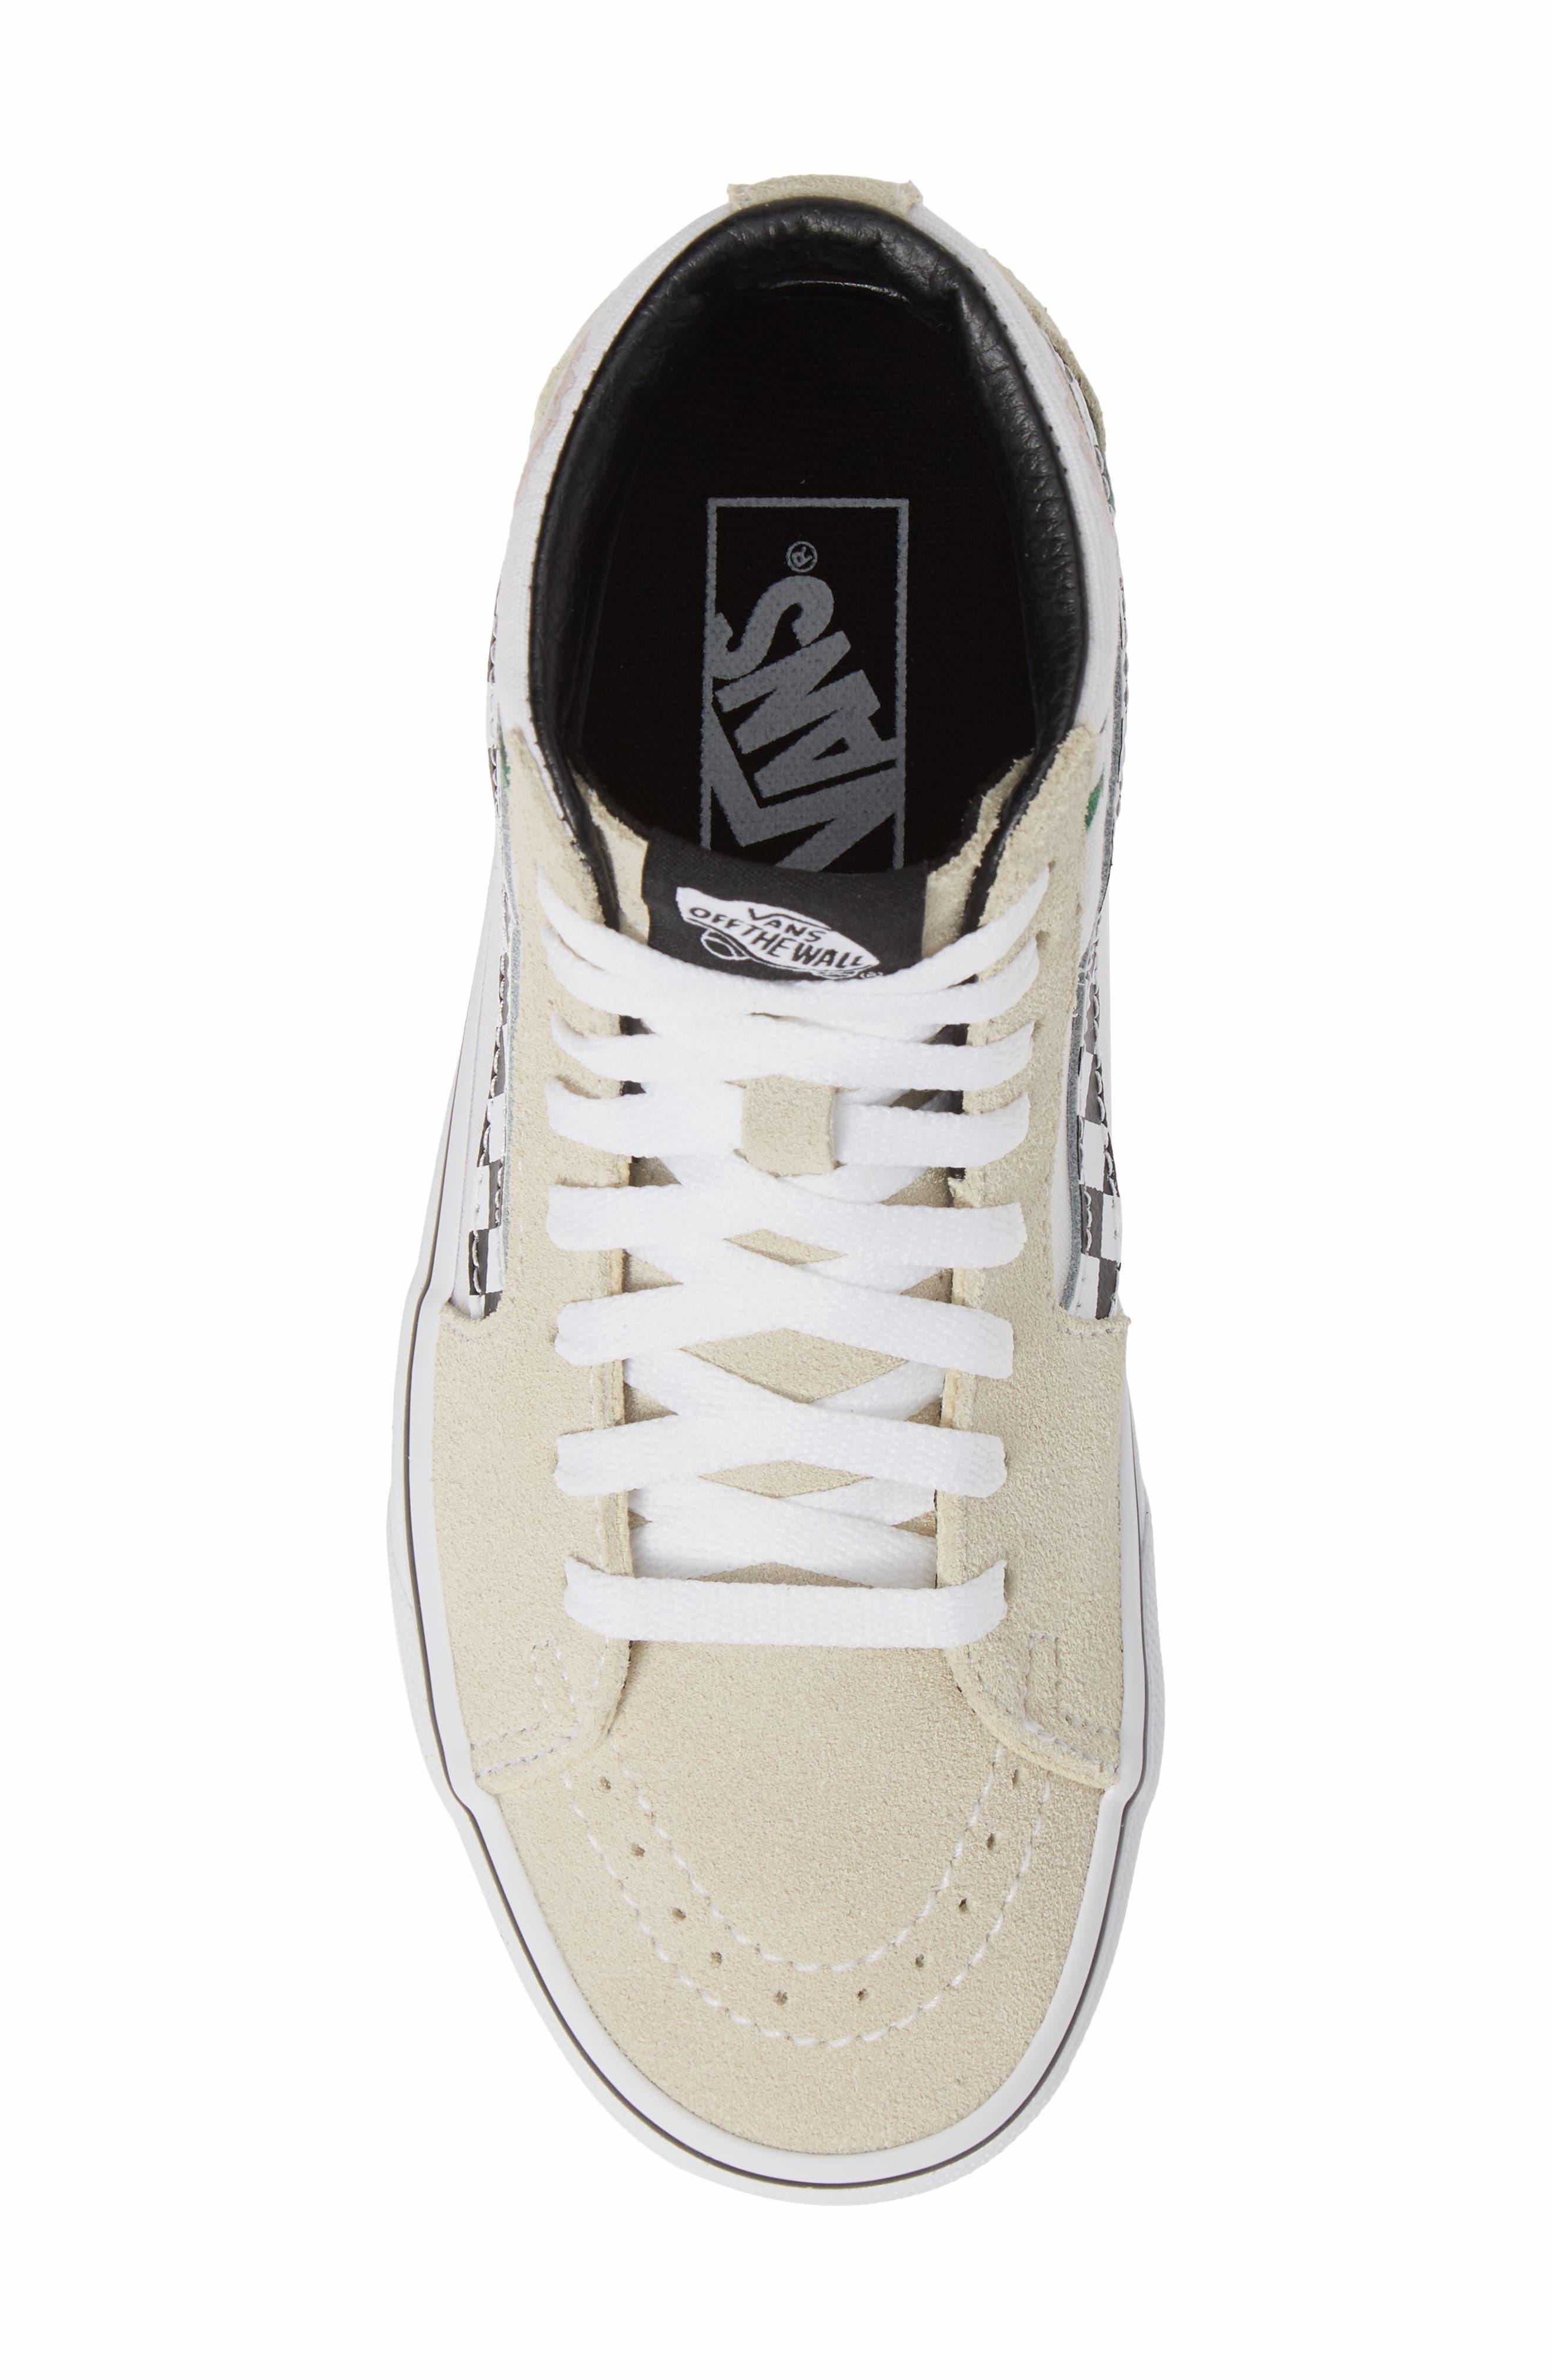 VANS,                             Sk8-Hi Checker Floral High Top Sneaker,                             Alternate thumbnail 5, color,                             CHECKER FLORAL TURTLEDOVE